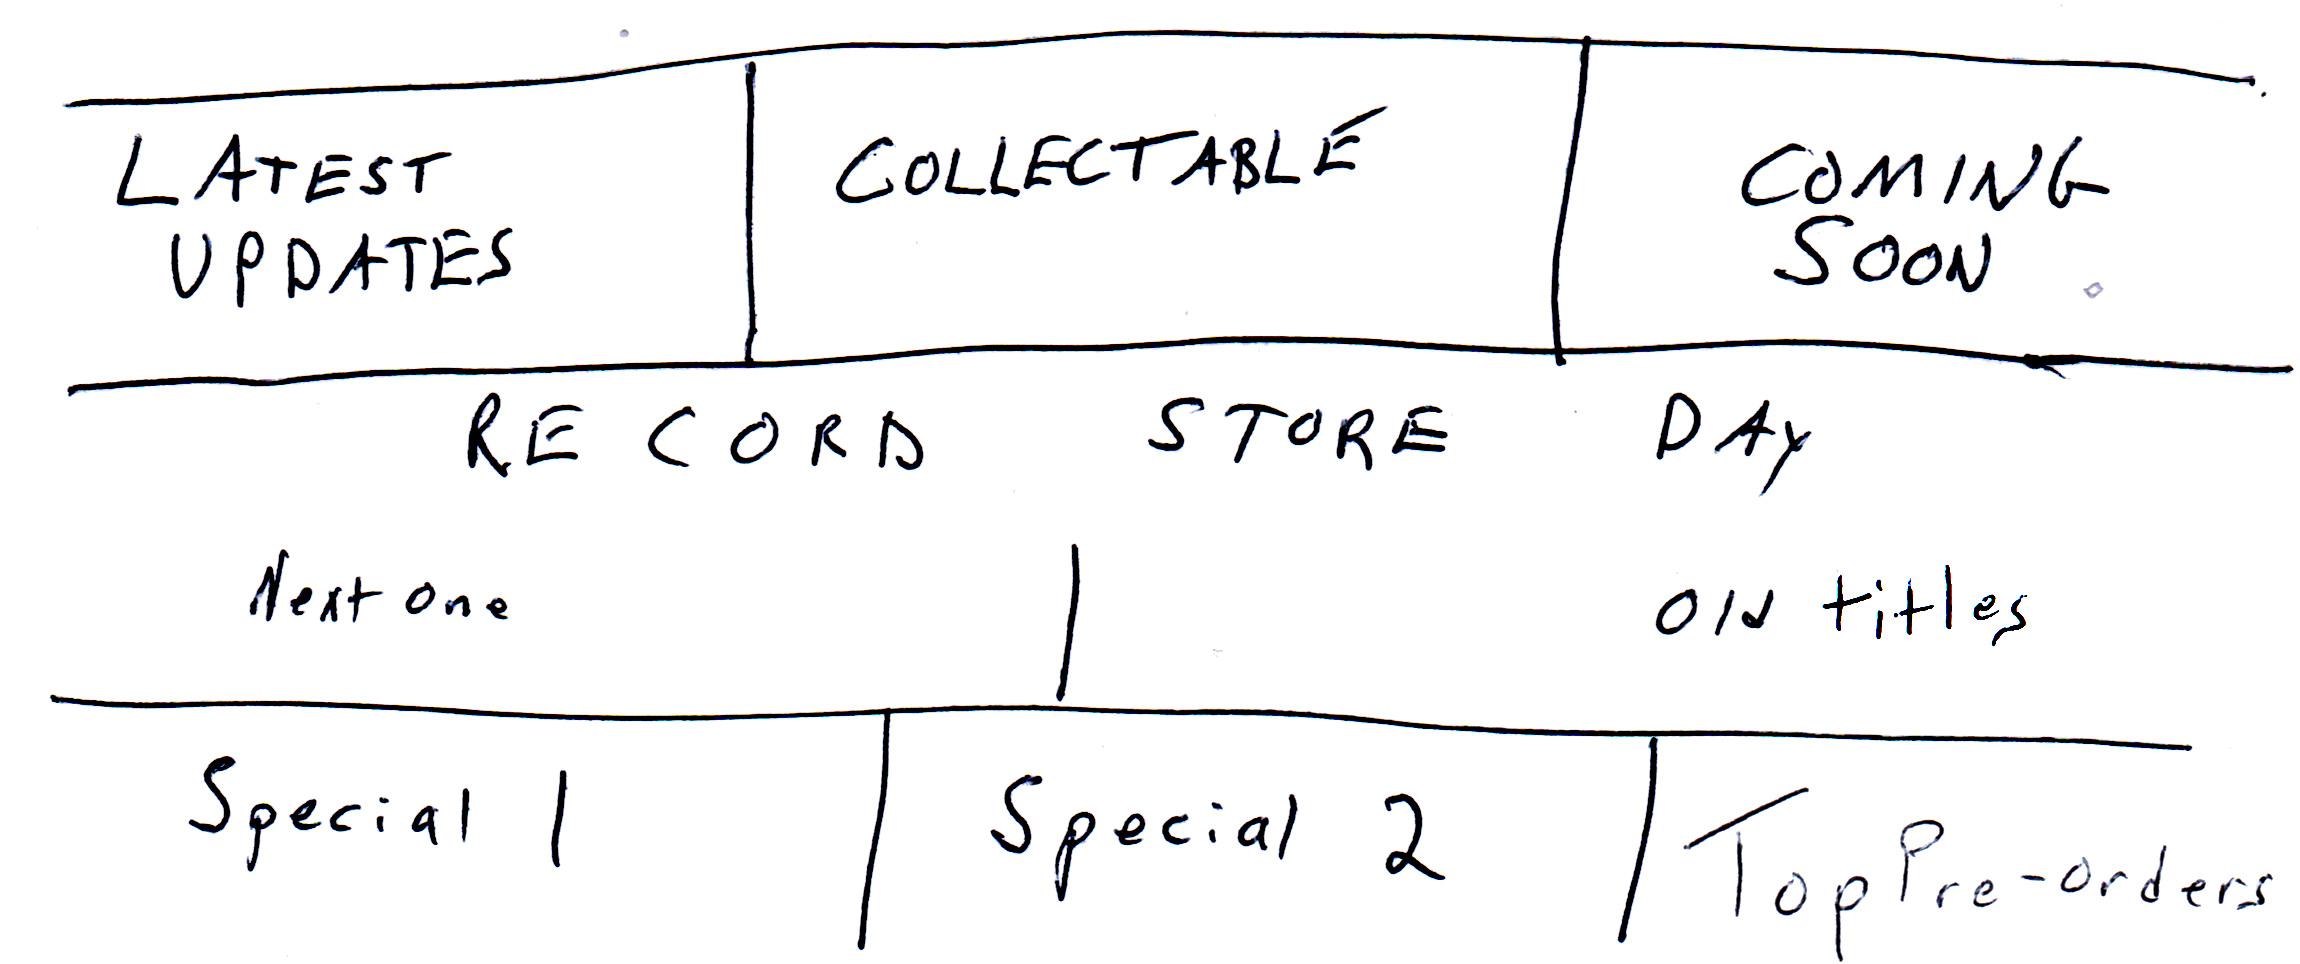 Vinyl menu